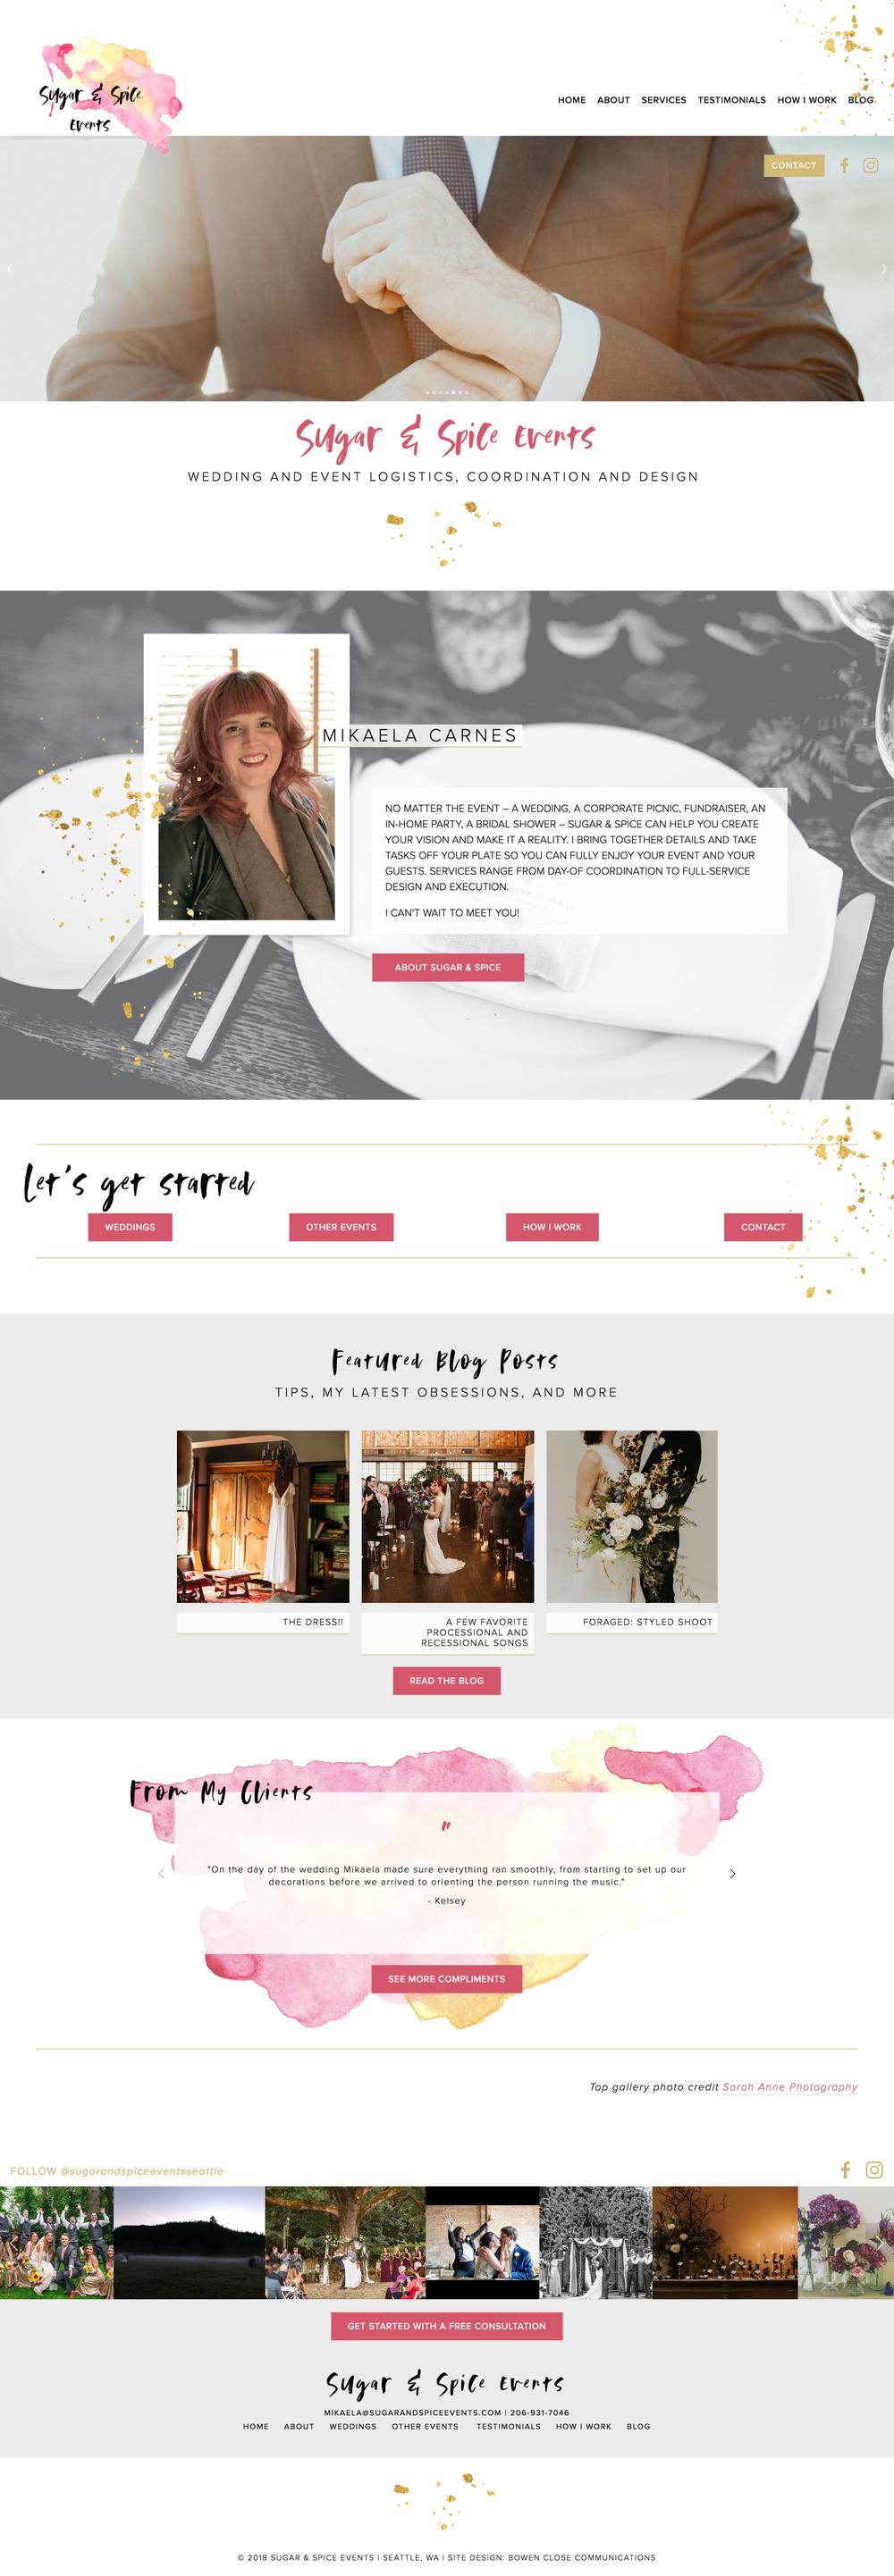 Sugar & Spice - homepage.png